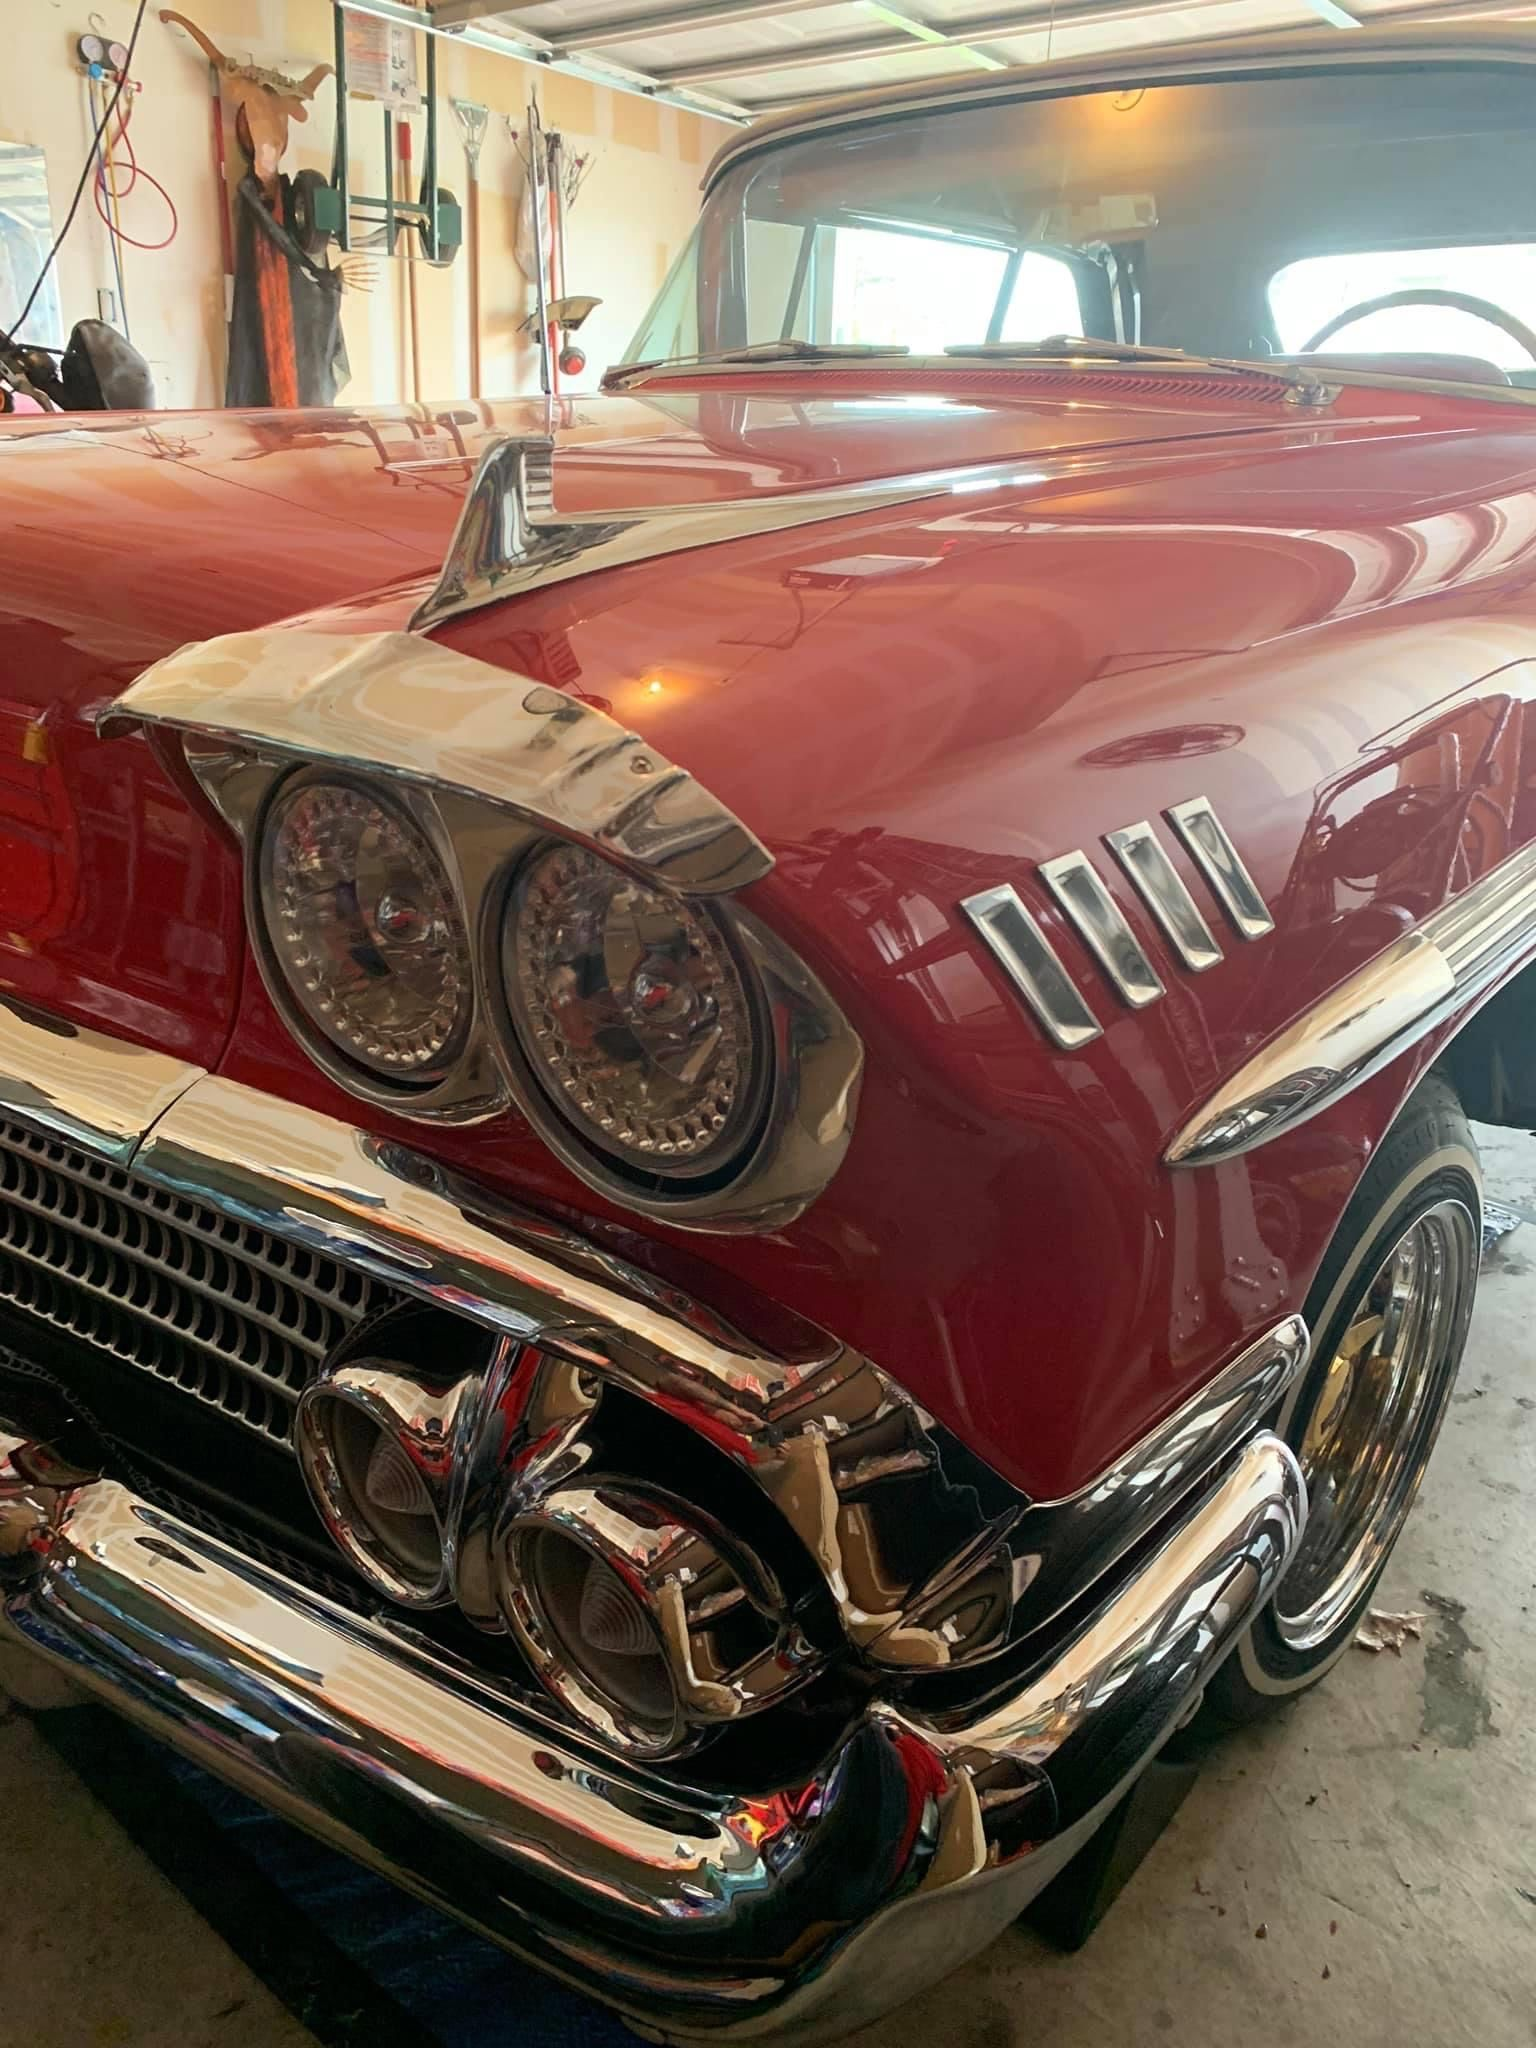 Pin On 1956 1957 1958 1959 1960 1961 1962 1963 1964 Chevrolet